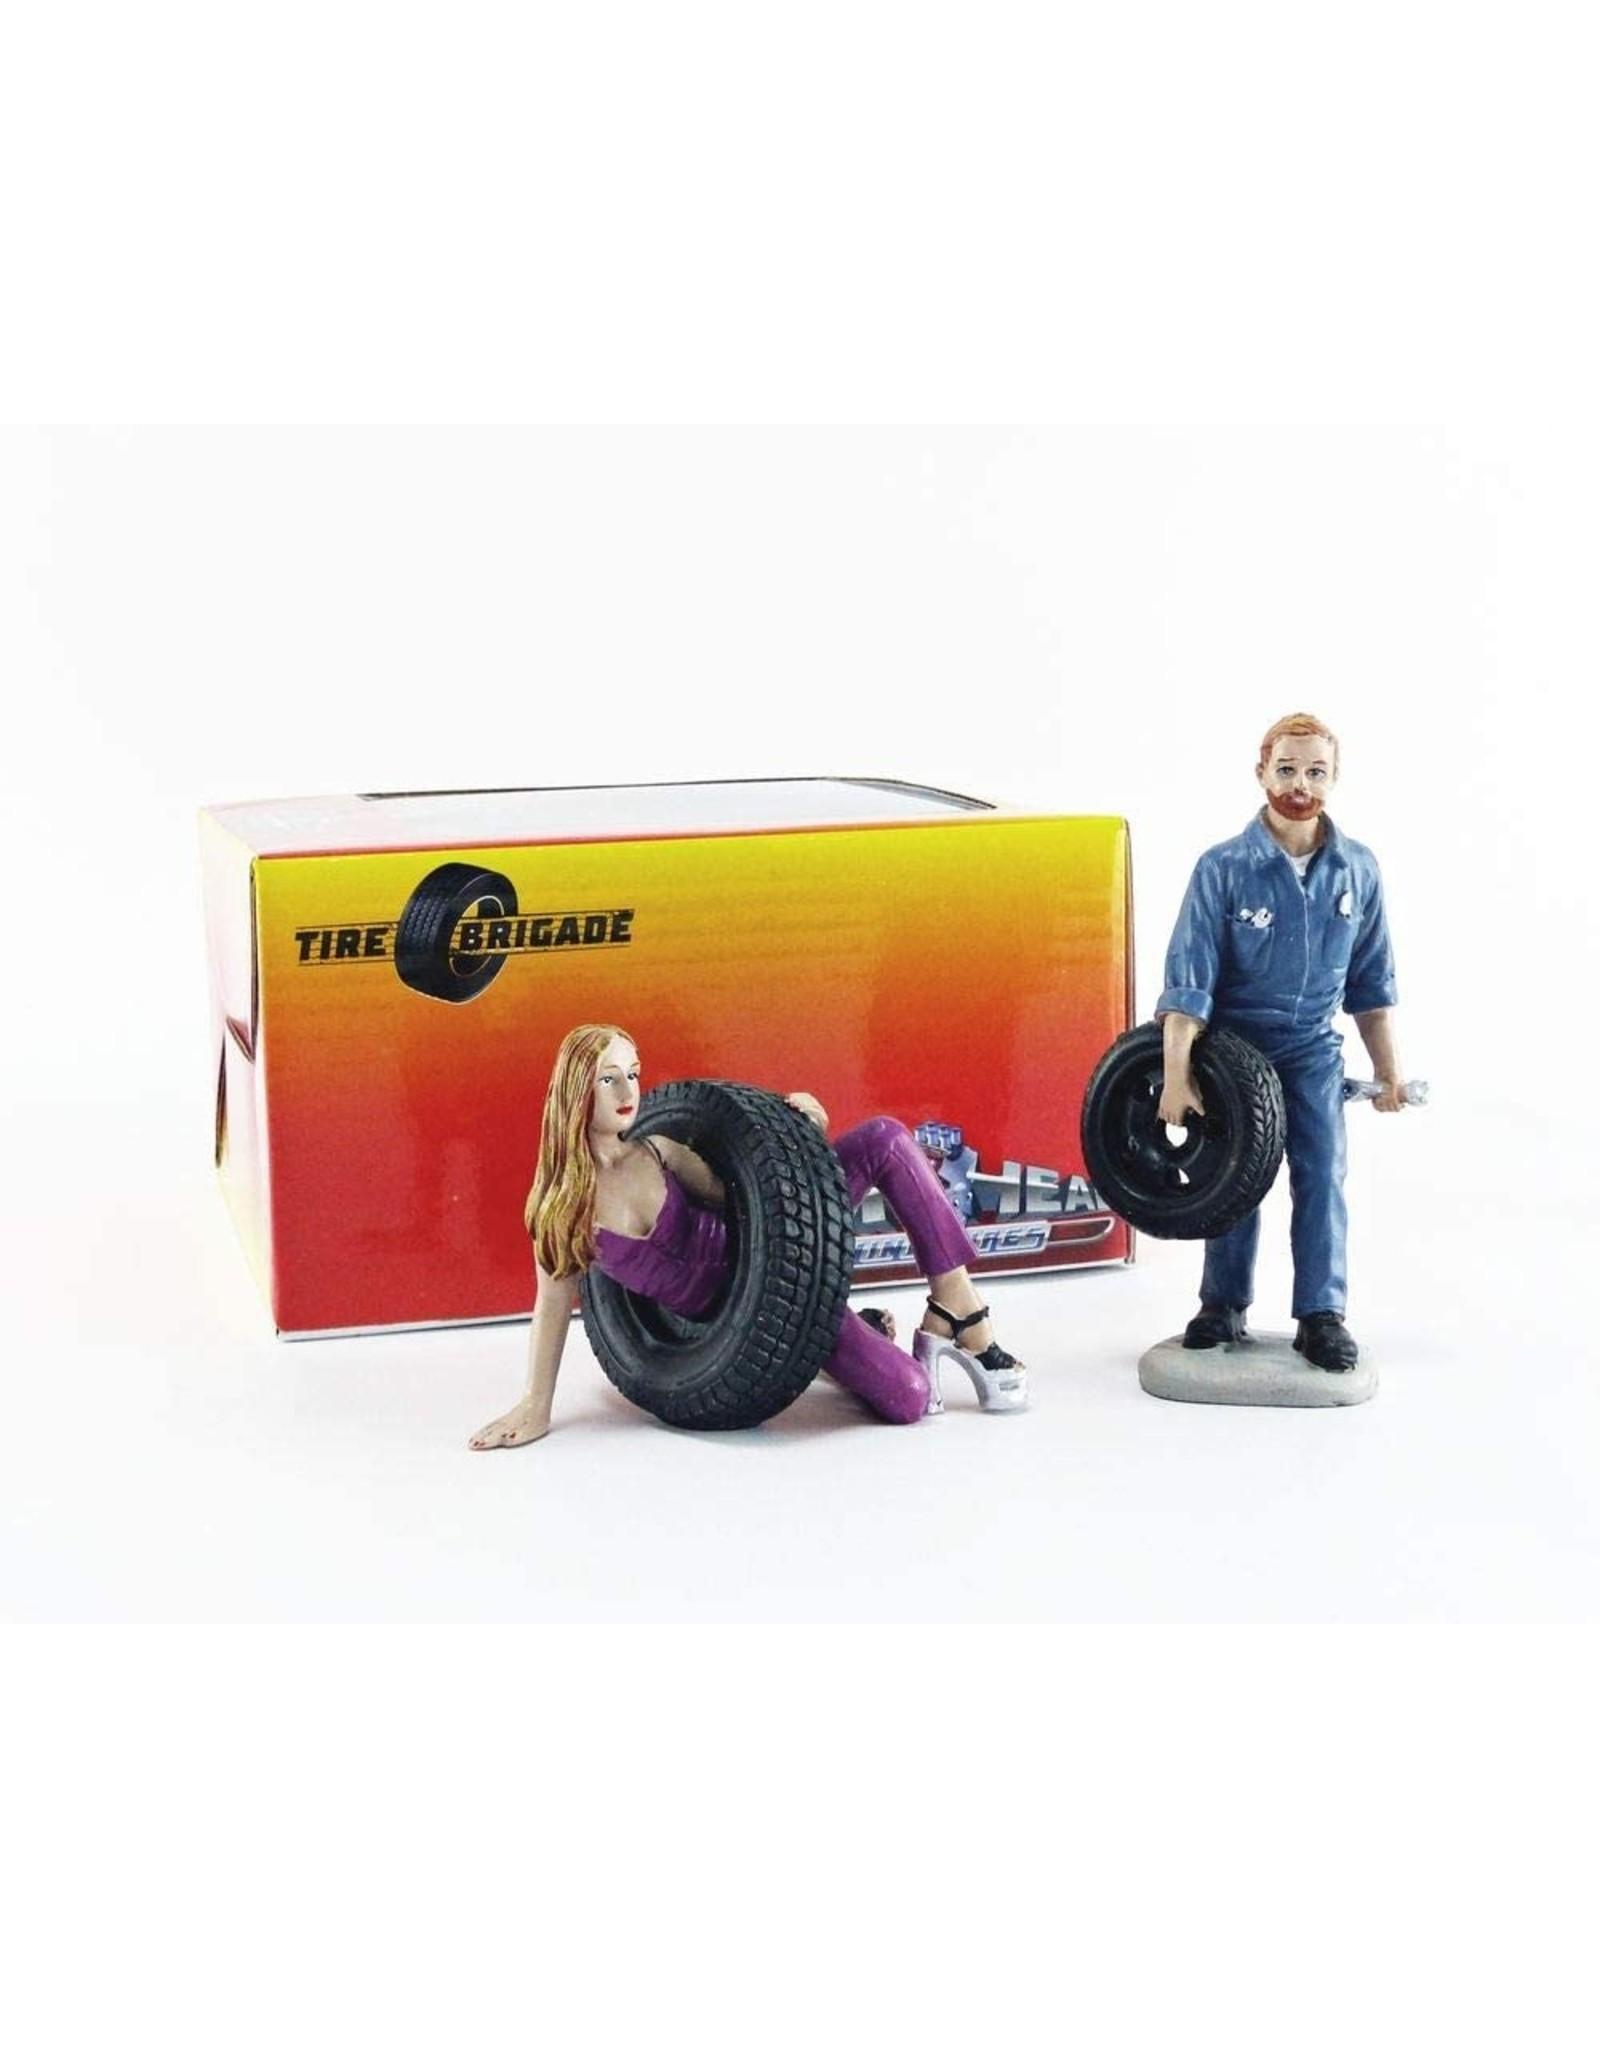 Tire Brigade Set #3 Val & Gery - 1:18 - Motorhead Miniatures